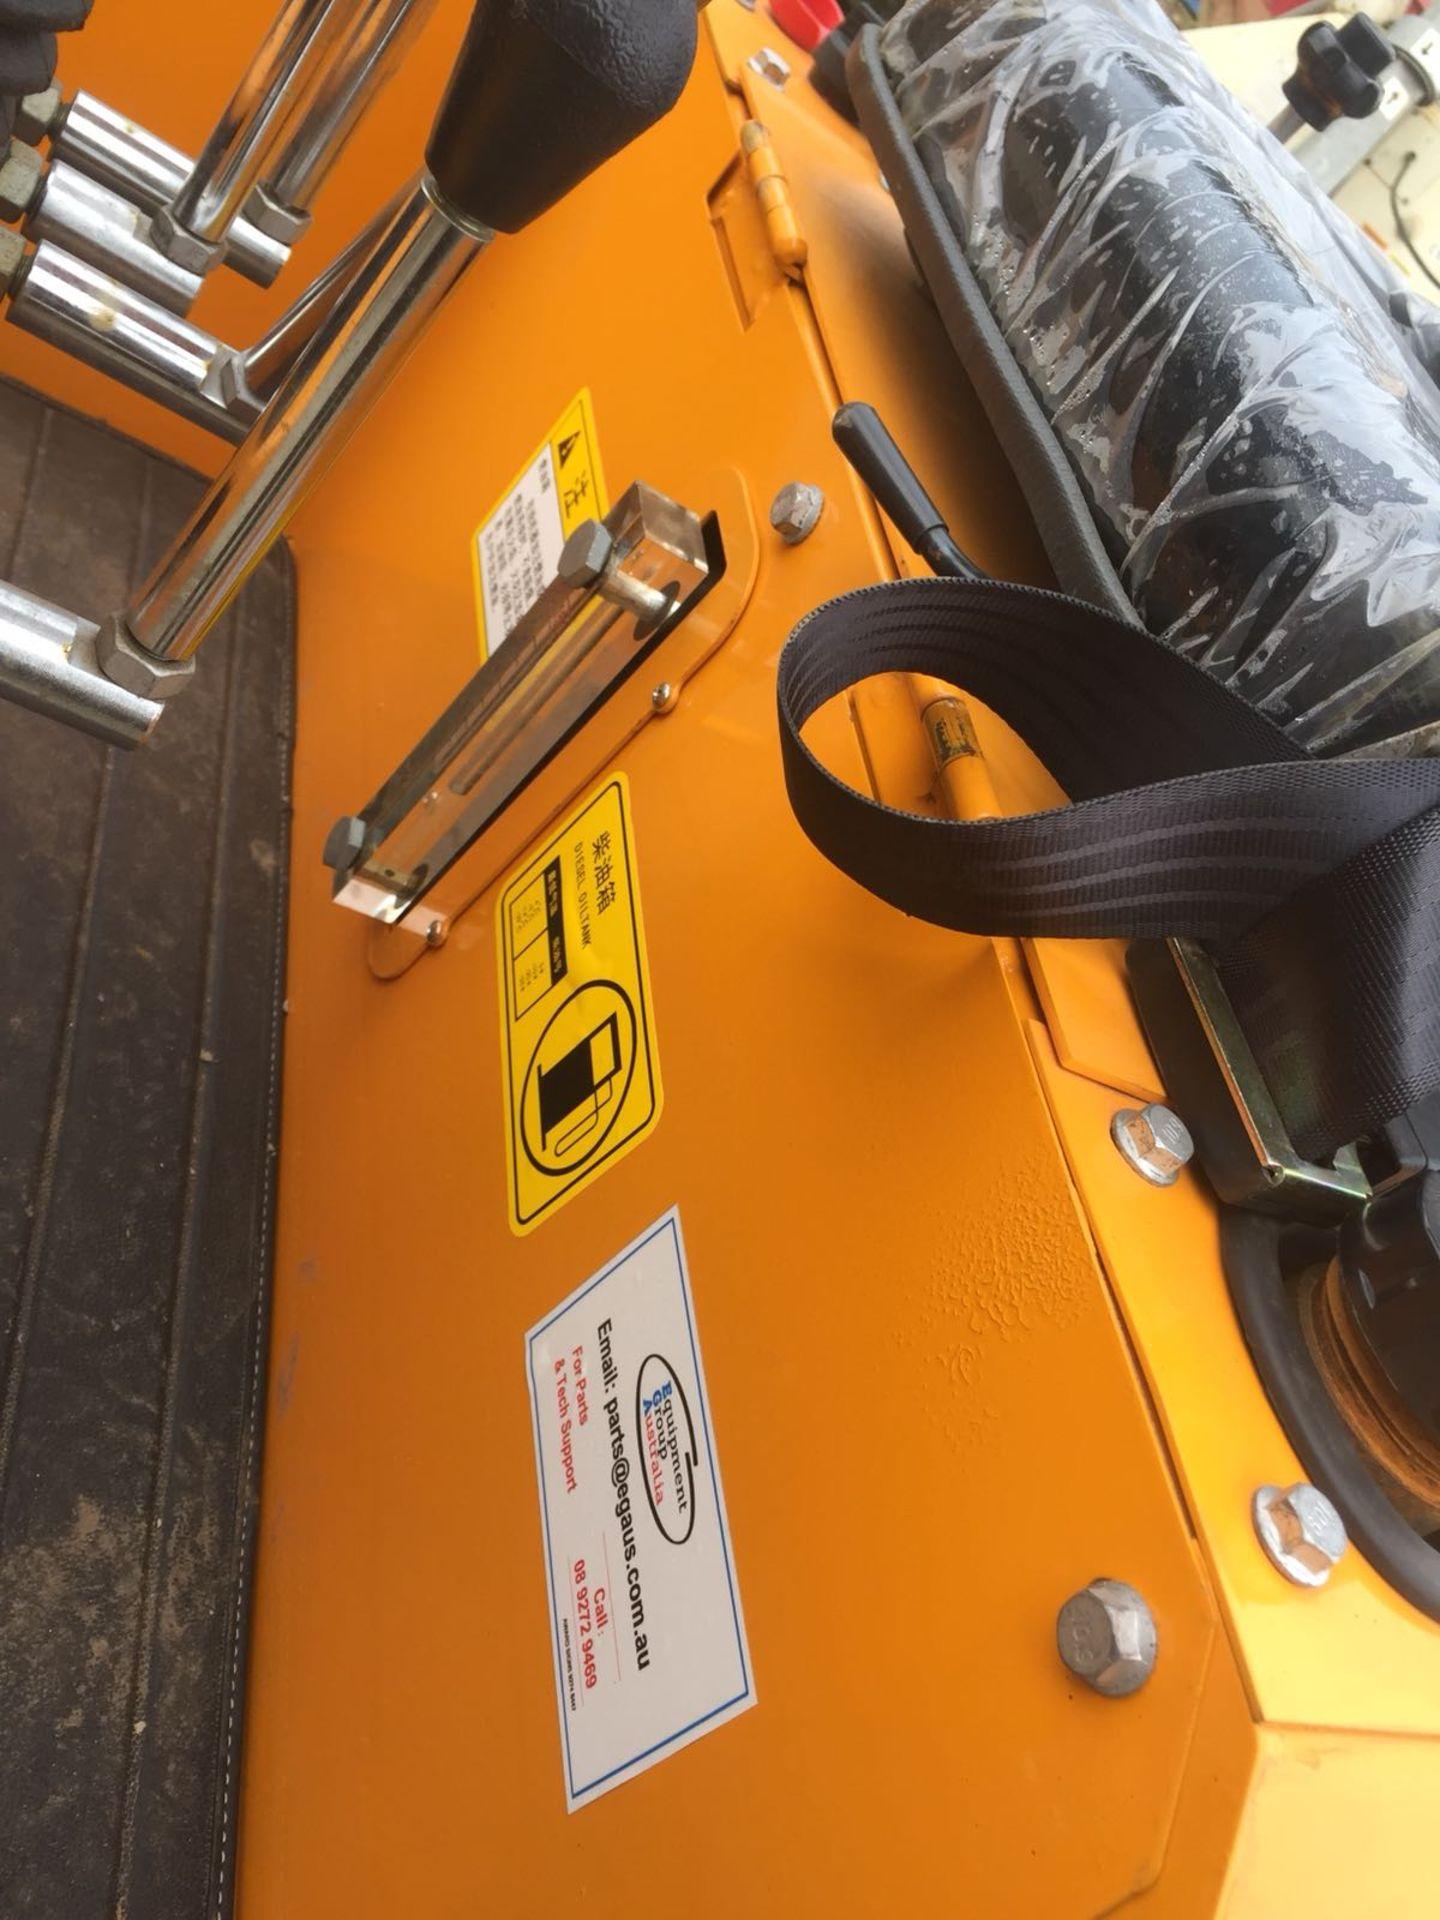 Lot 59 - BRAND NEW MINI TRACKED EXCAVATOR MICRO RHINOCEROS XN08 *PLUS VAT*